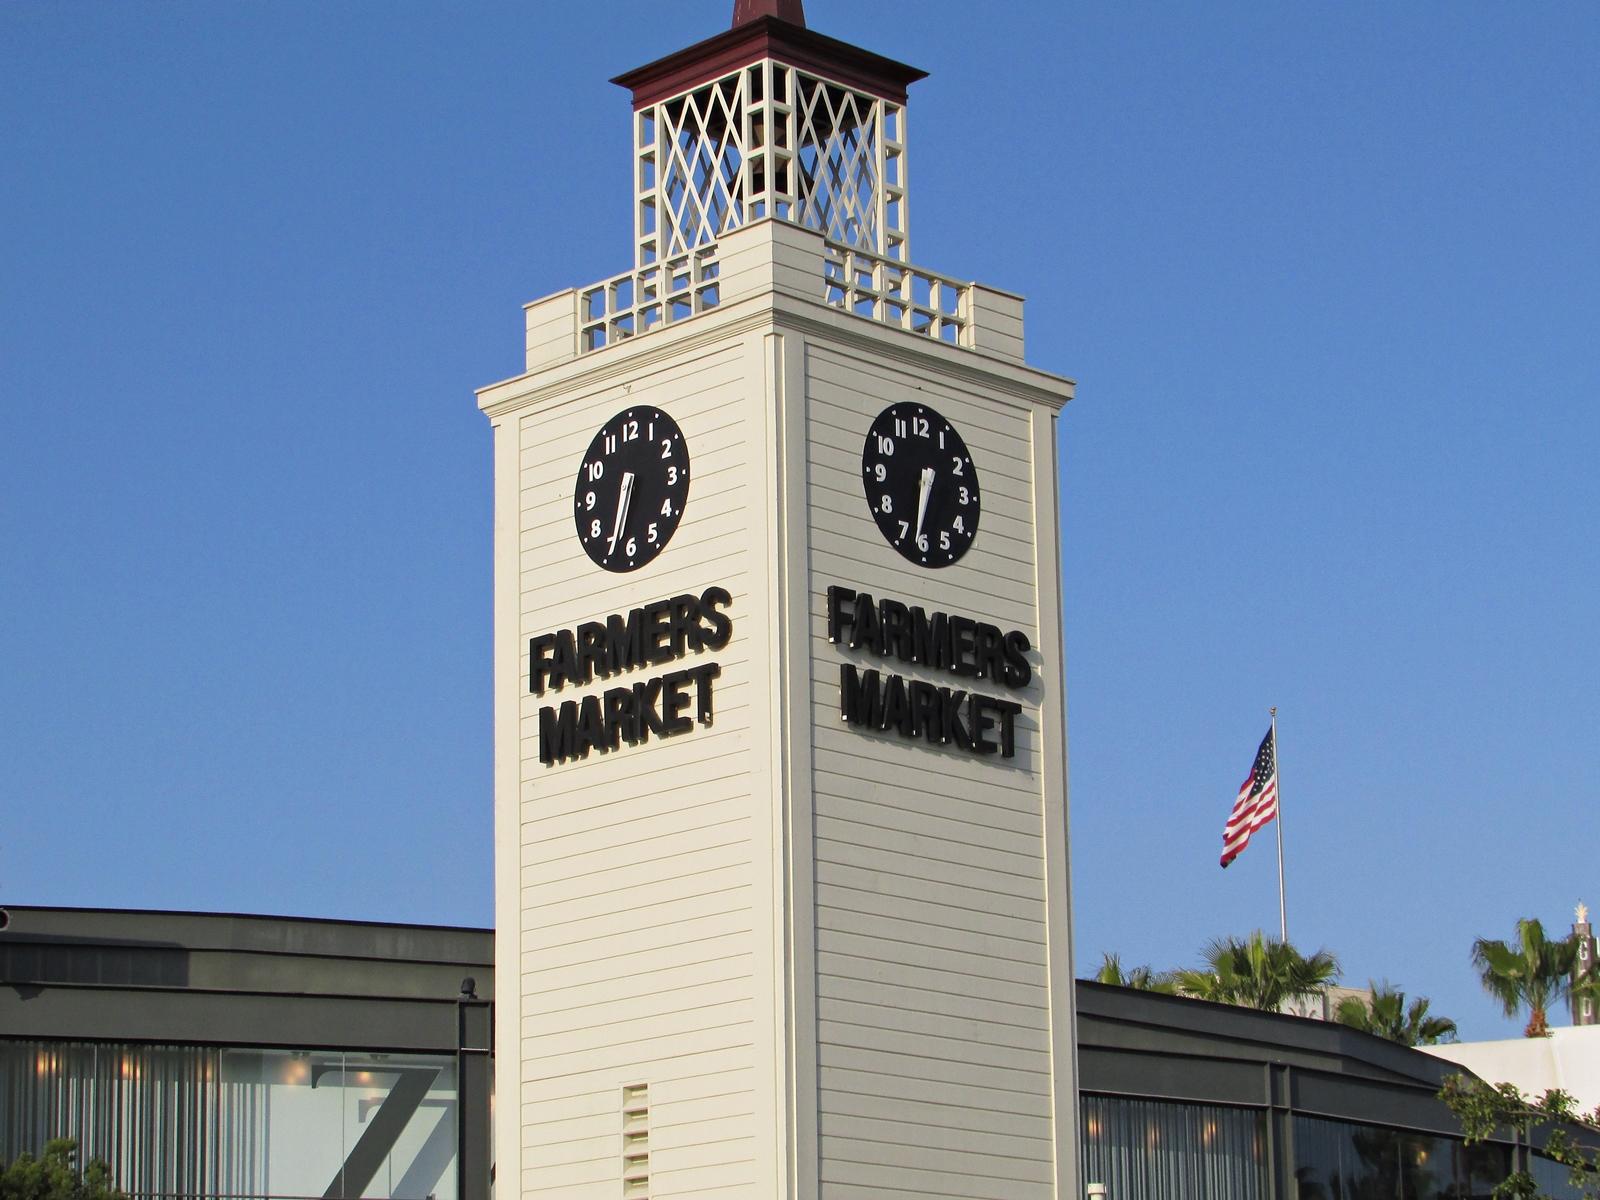 Beverly Hills - Farmers Market - USA Roadtrip - Amerika Rundreise - Fashionladyloves by Tamara Wagner Travelblog